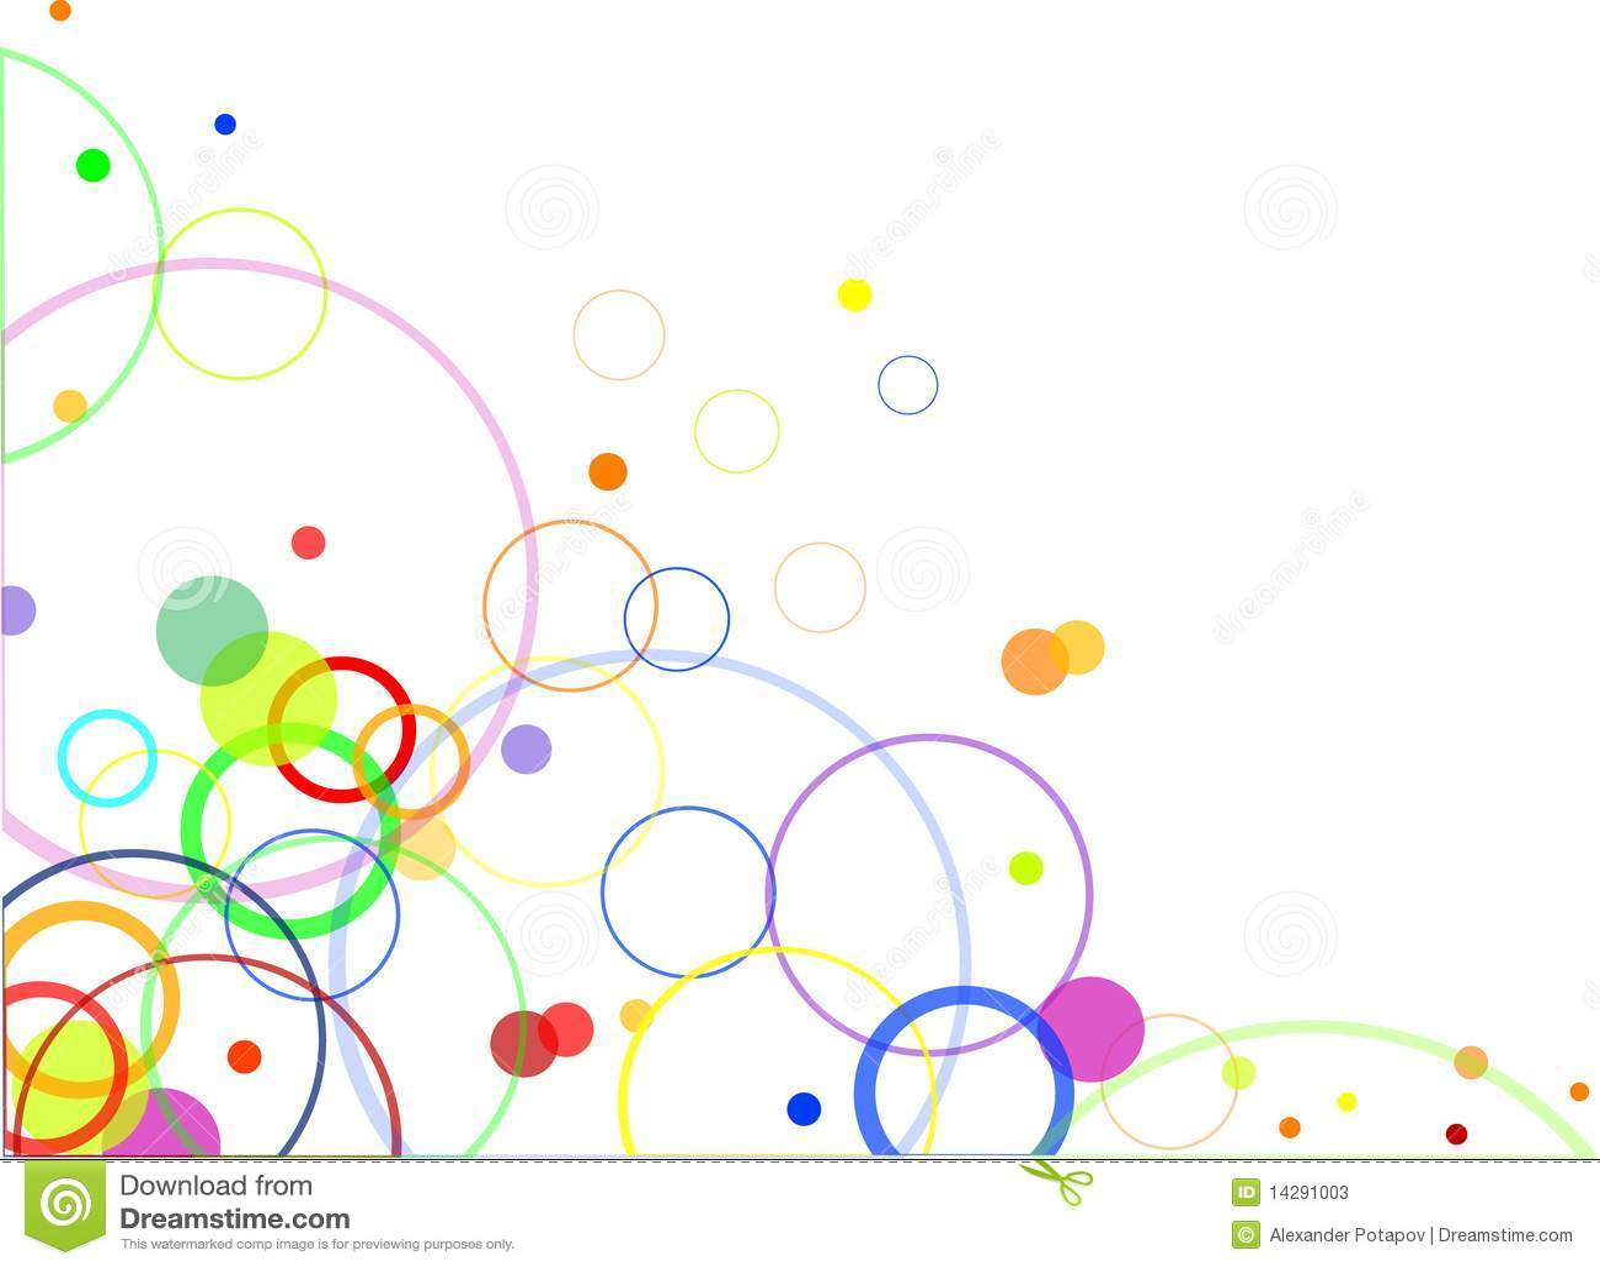 Projeto abstrato com círculos de cor